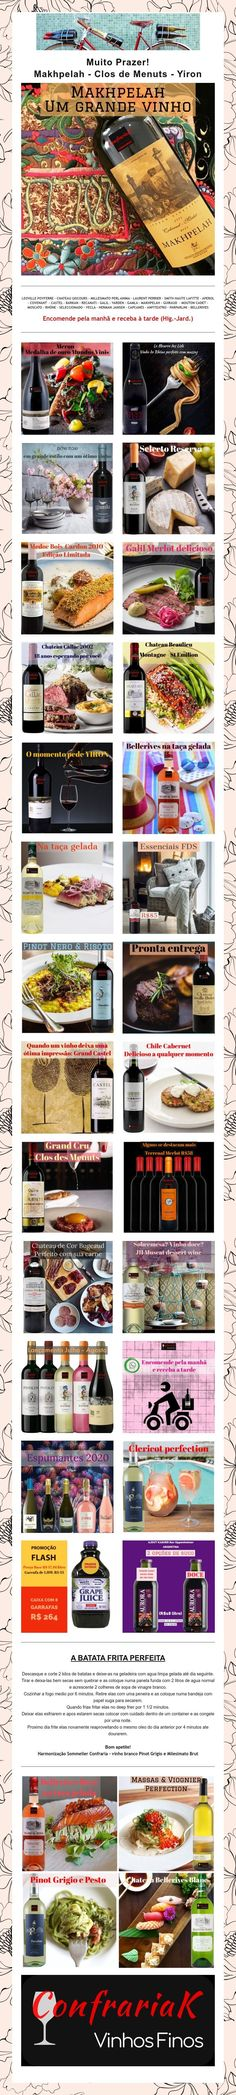 Muito Prazer!  Makhpelah -Clos de Menuts - Yiron Mouton Cadet, Laurent Perrier, Wine Pairings